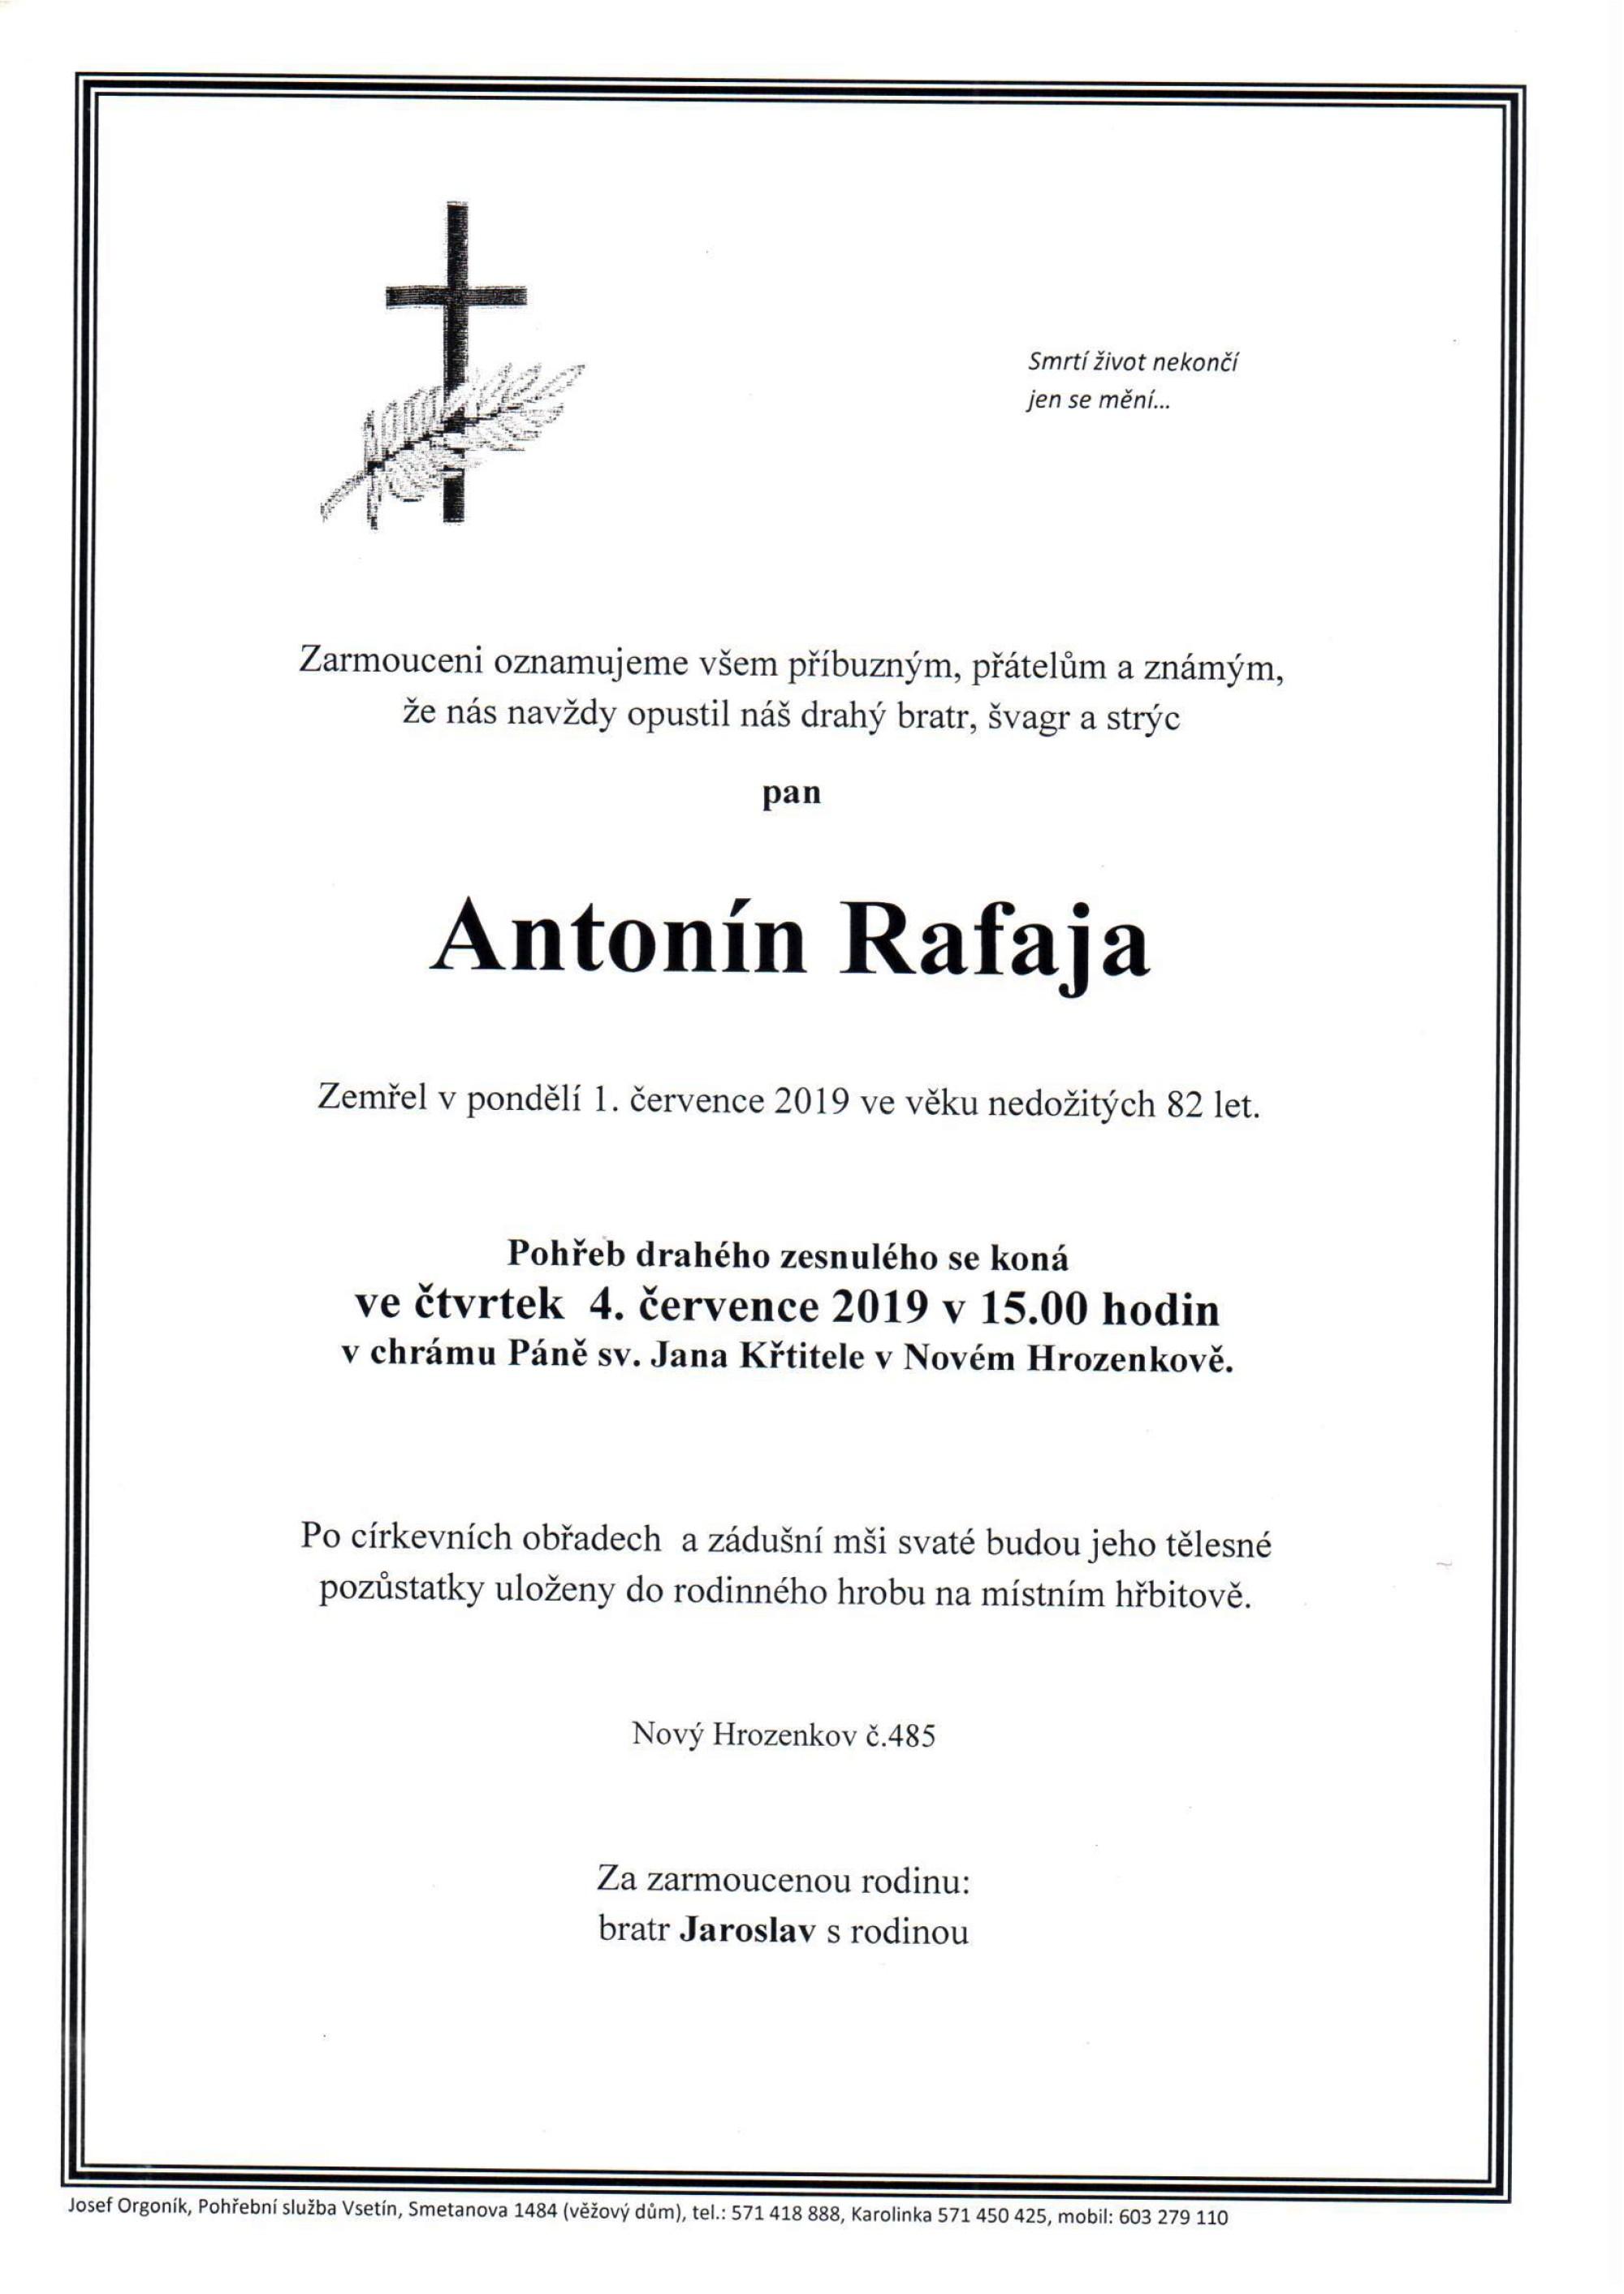 Antonín Rafaja